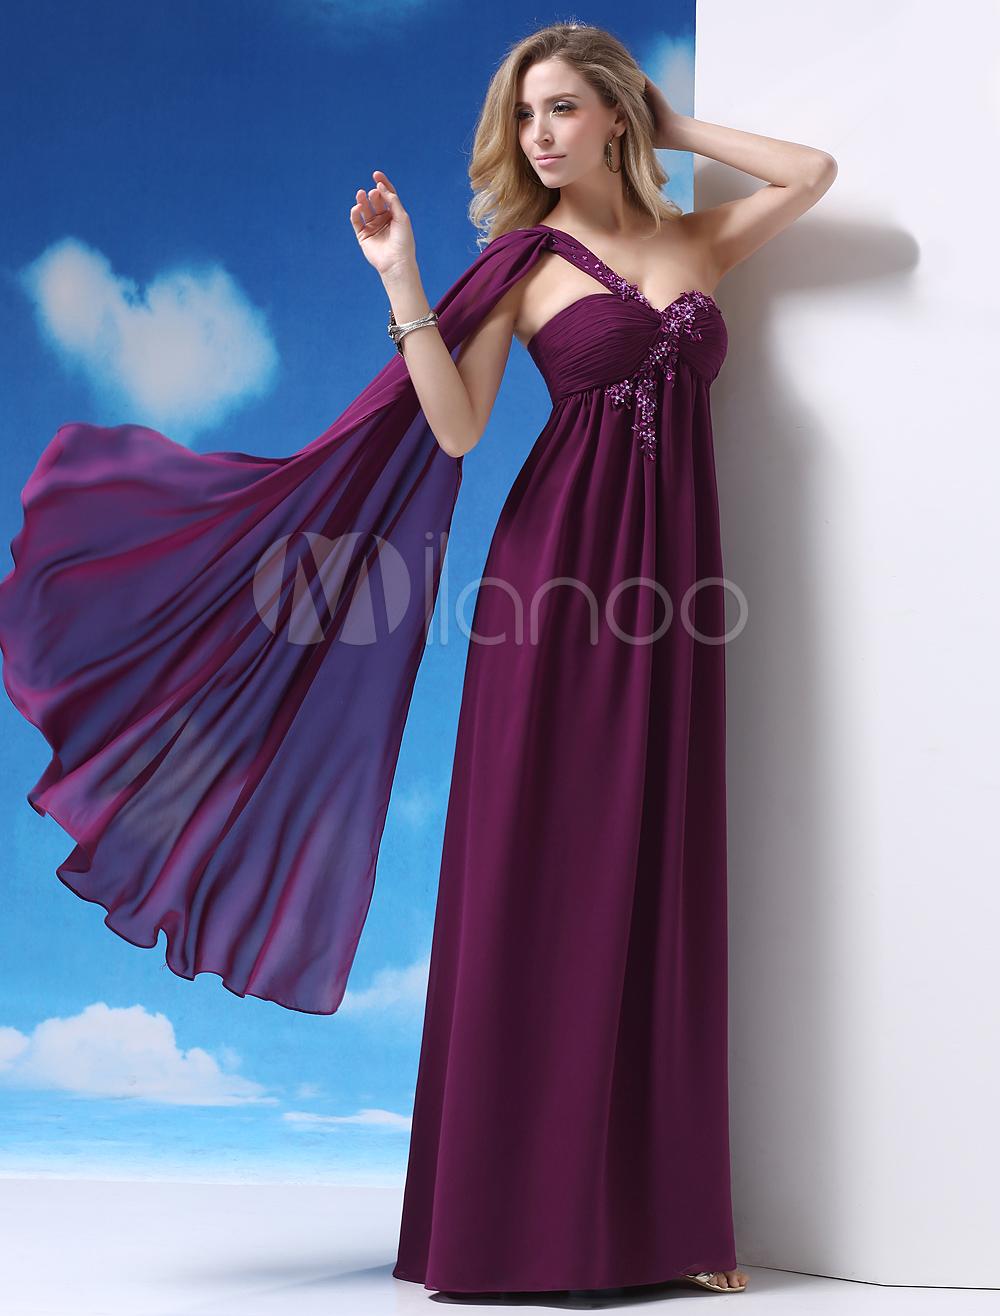 Vestido de fiesta de chifón de violeta oscura de un solo hombro ...